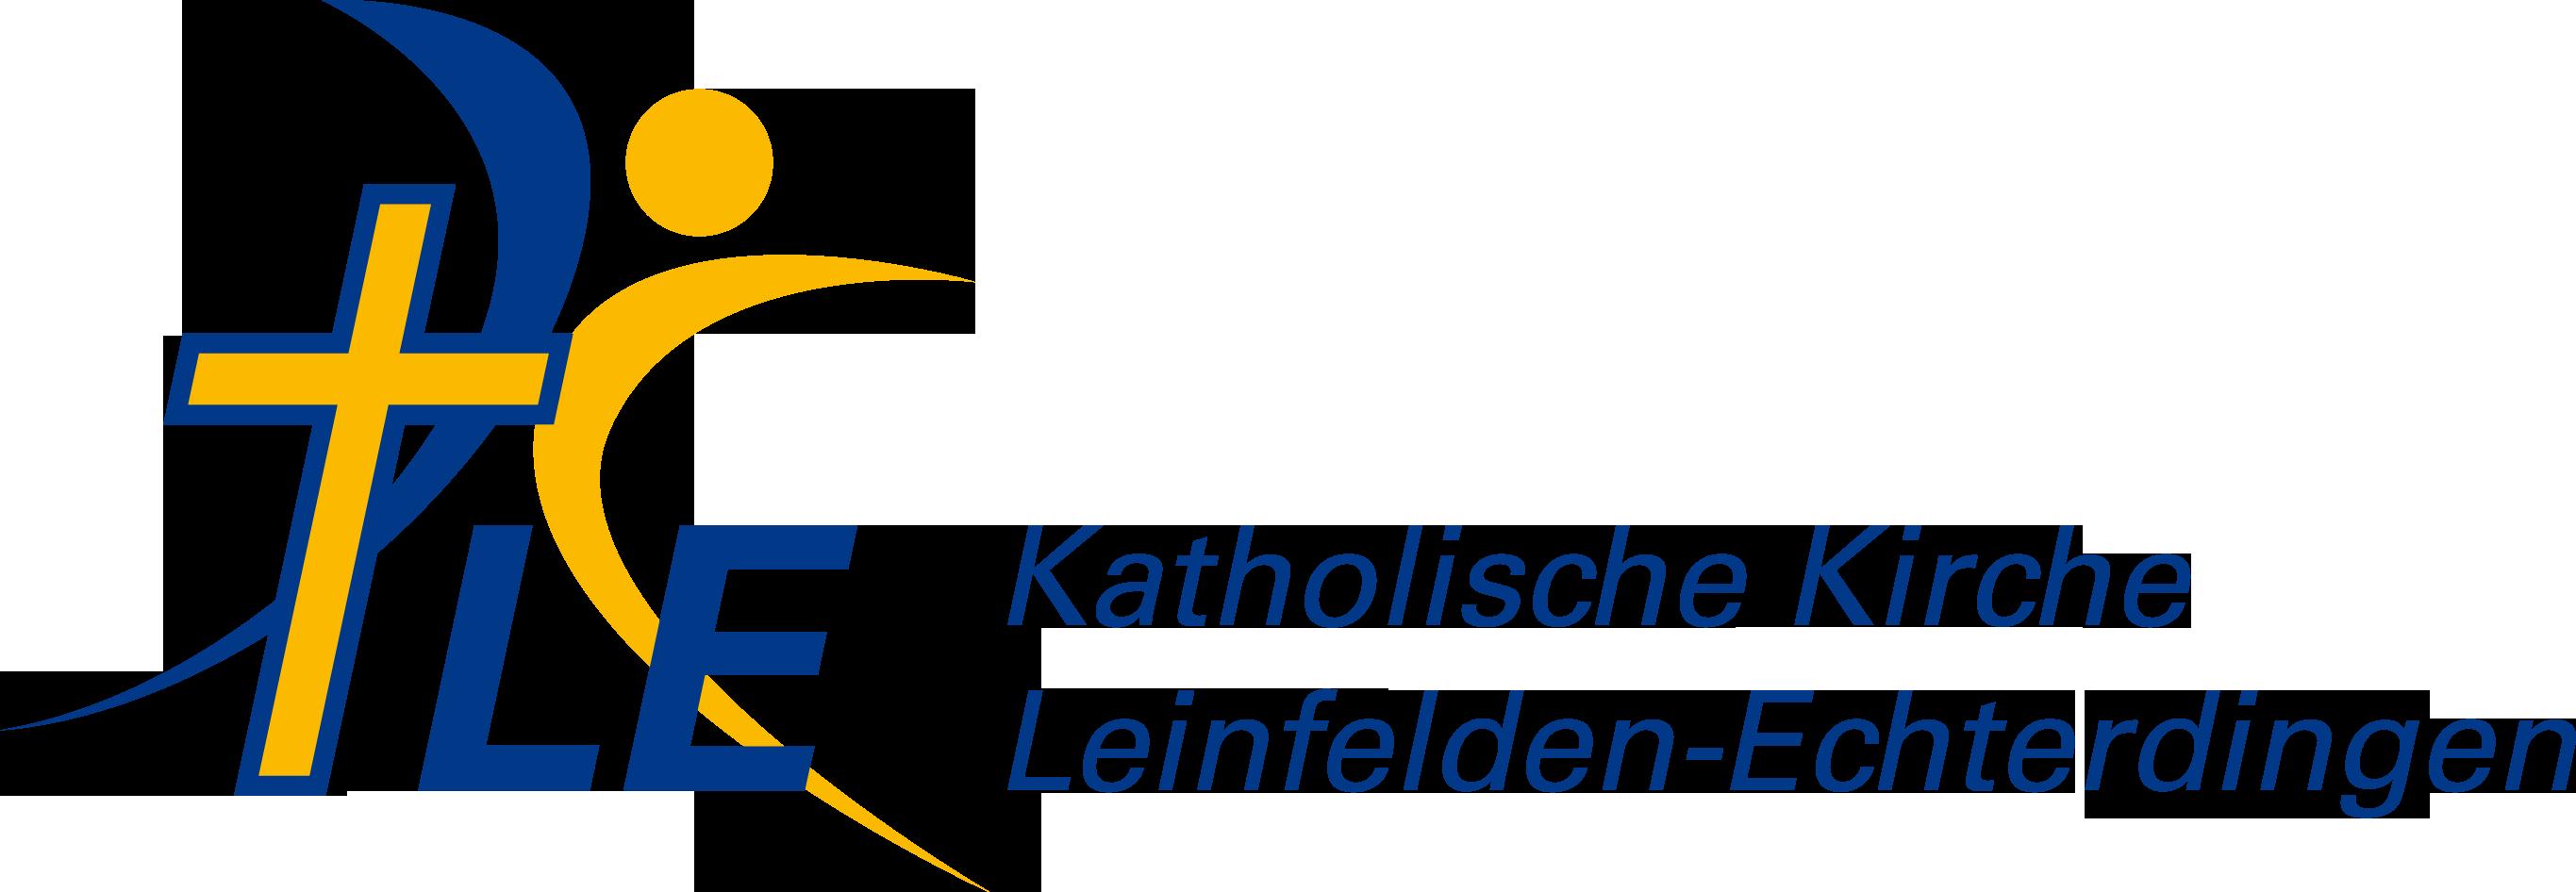 Katholische Kirche Leinfelden-Echterdingen